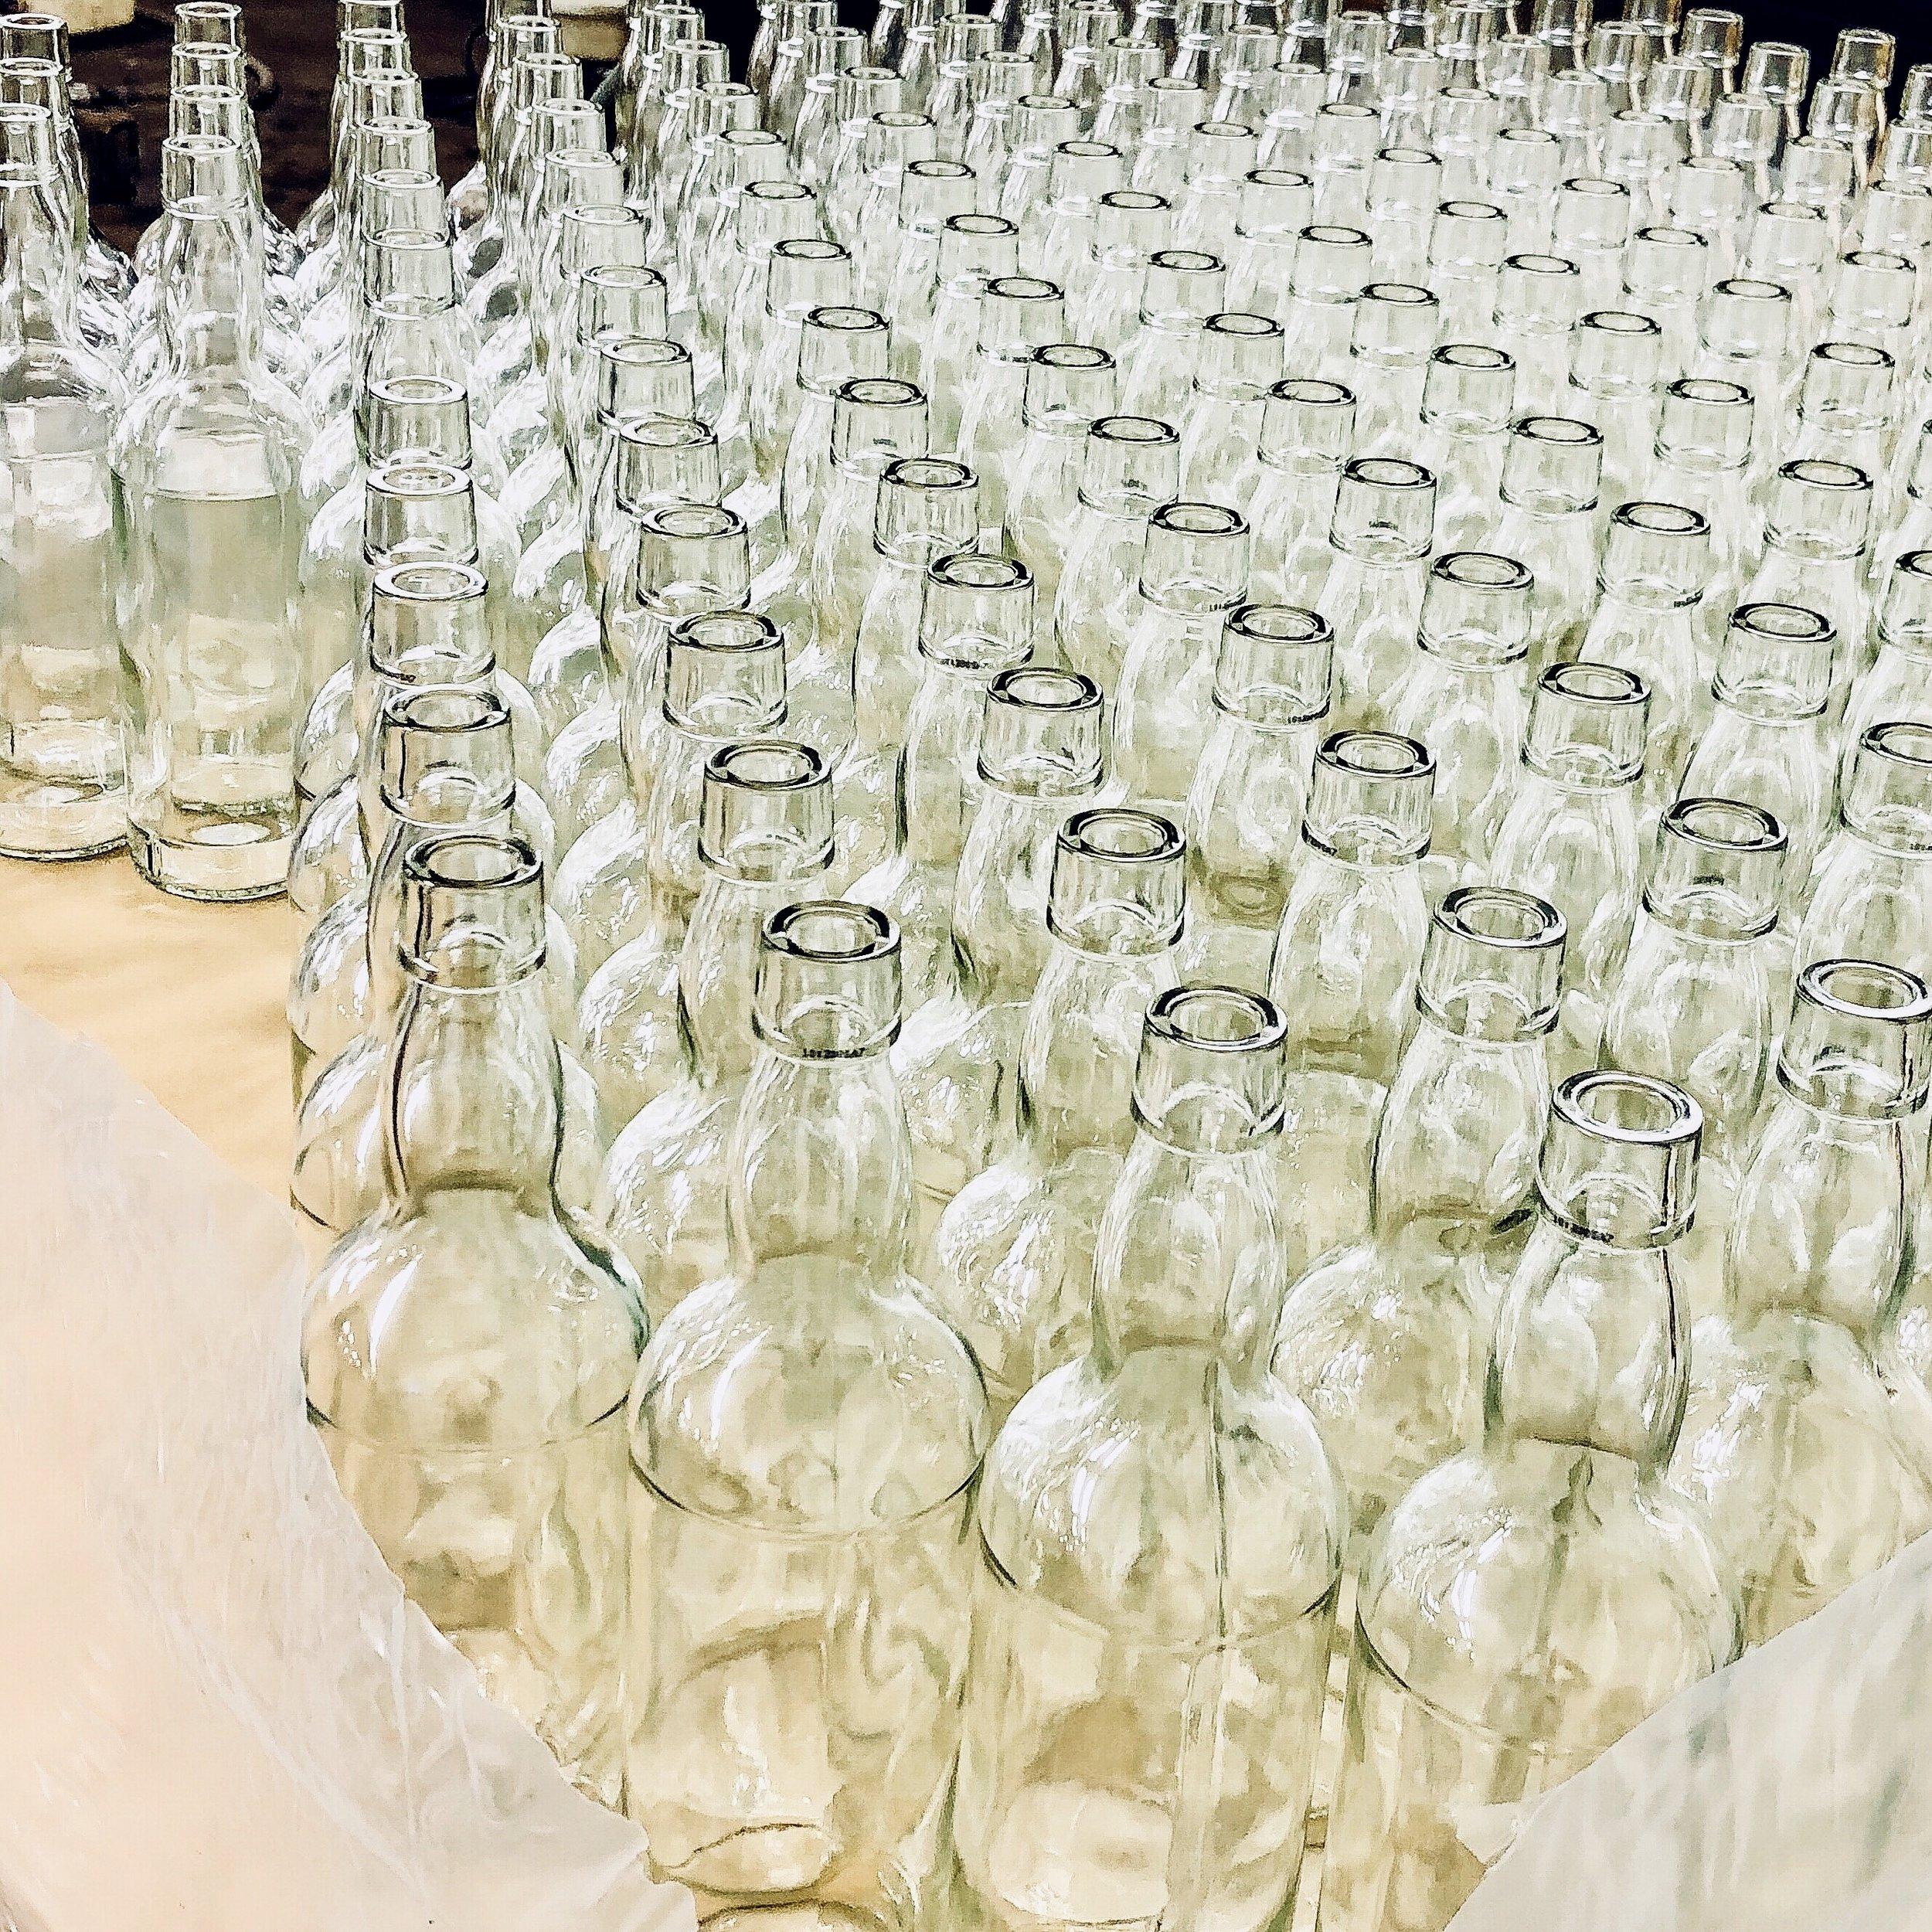 The bottling hall - On site bottling at Springbank and Kilchoman